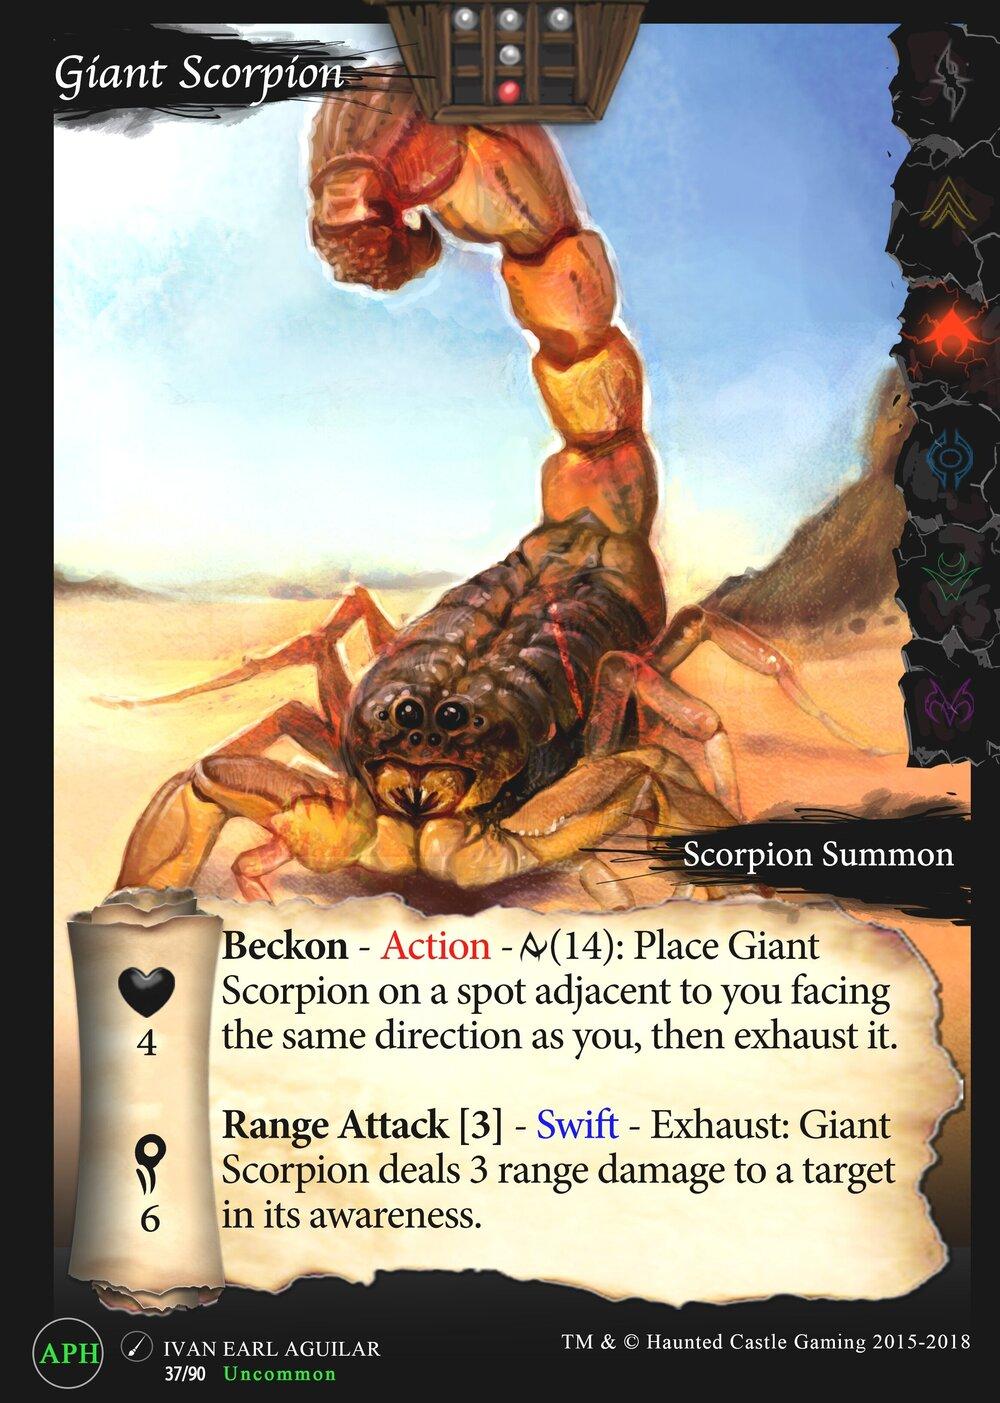 37-Giant Scorpion.jpg